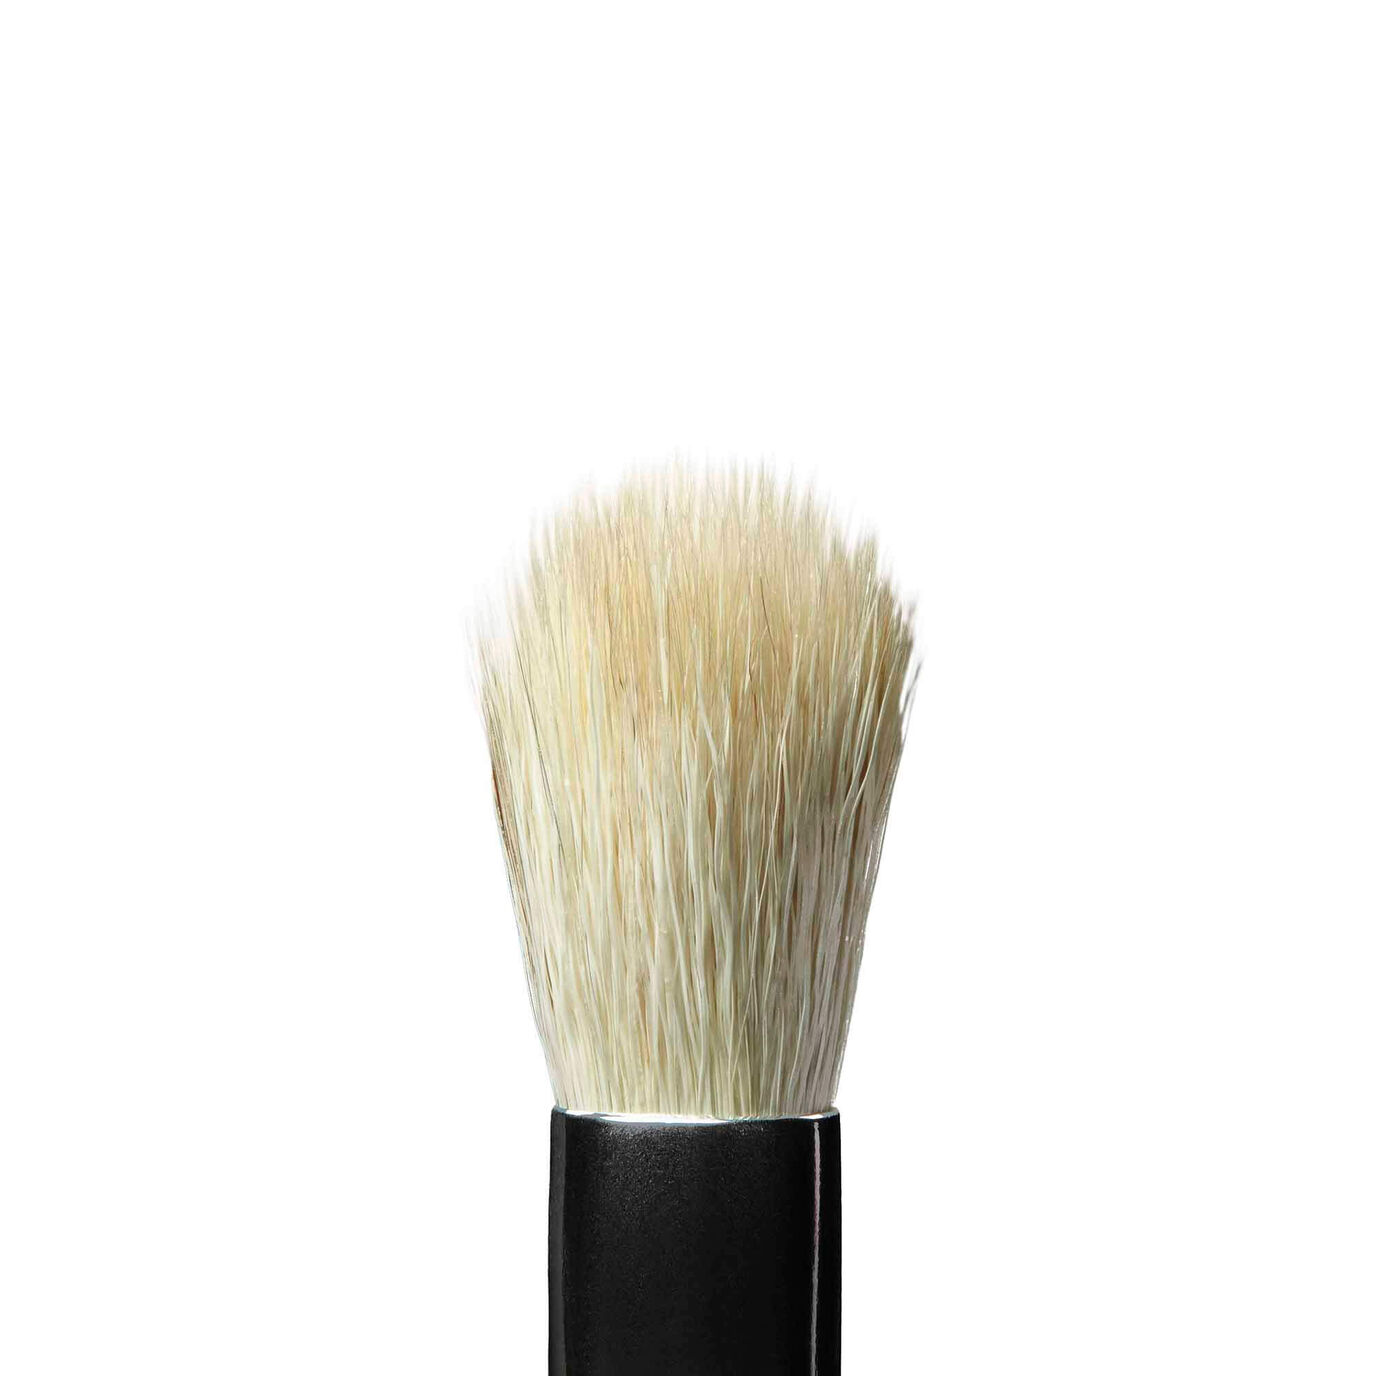 A10 Pro Brush - Diffuser Brush